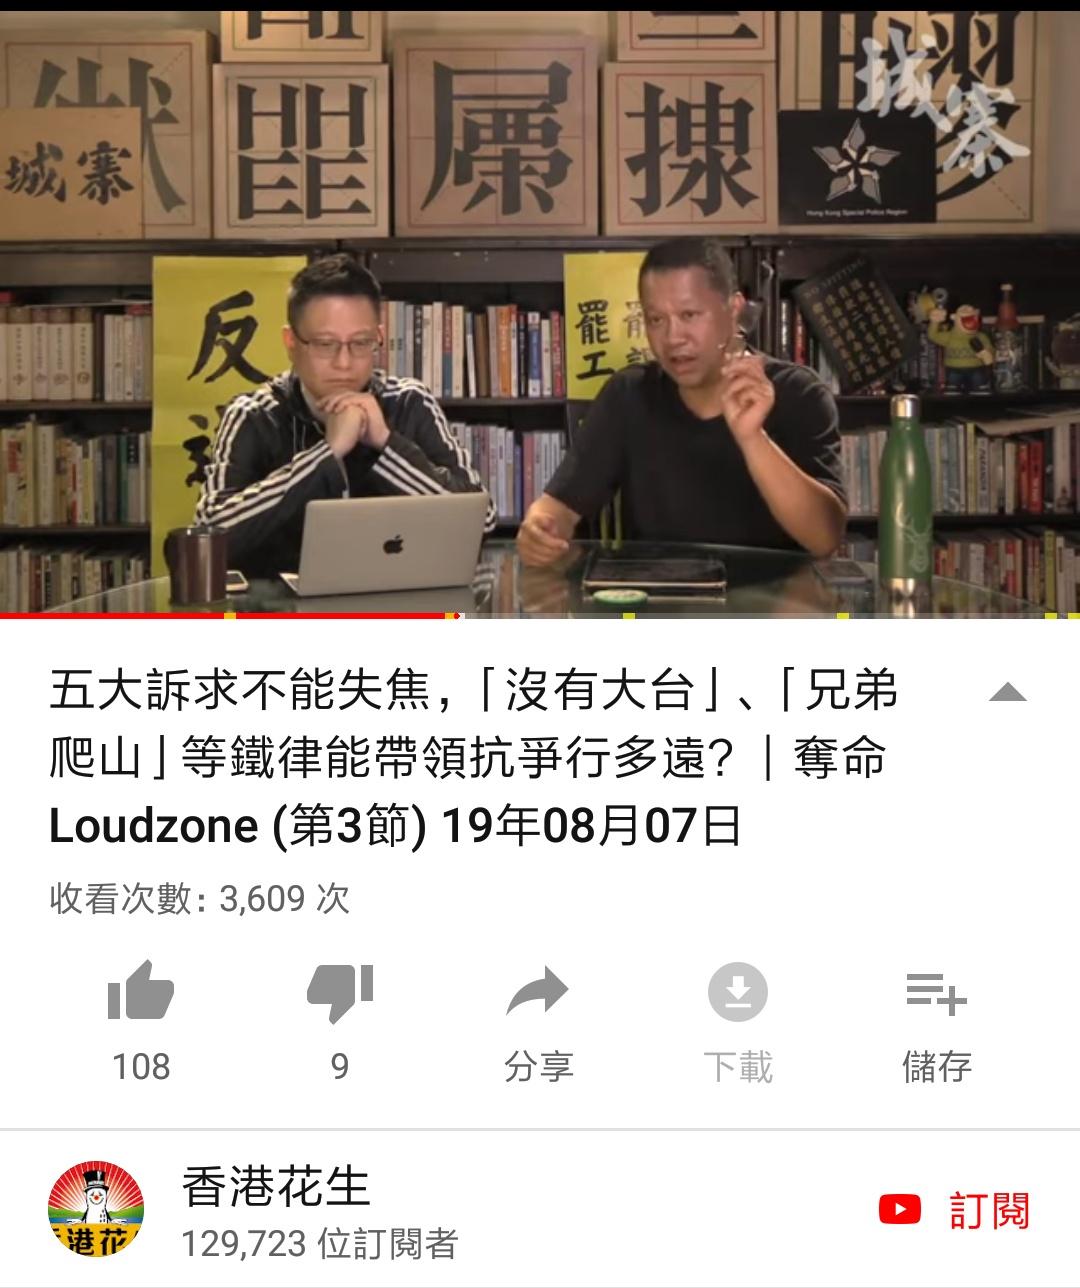 https://upload.cc/i1/2019/08/07/hQj7PD.png